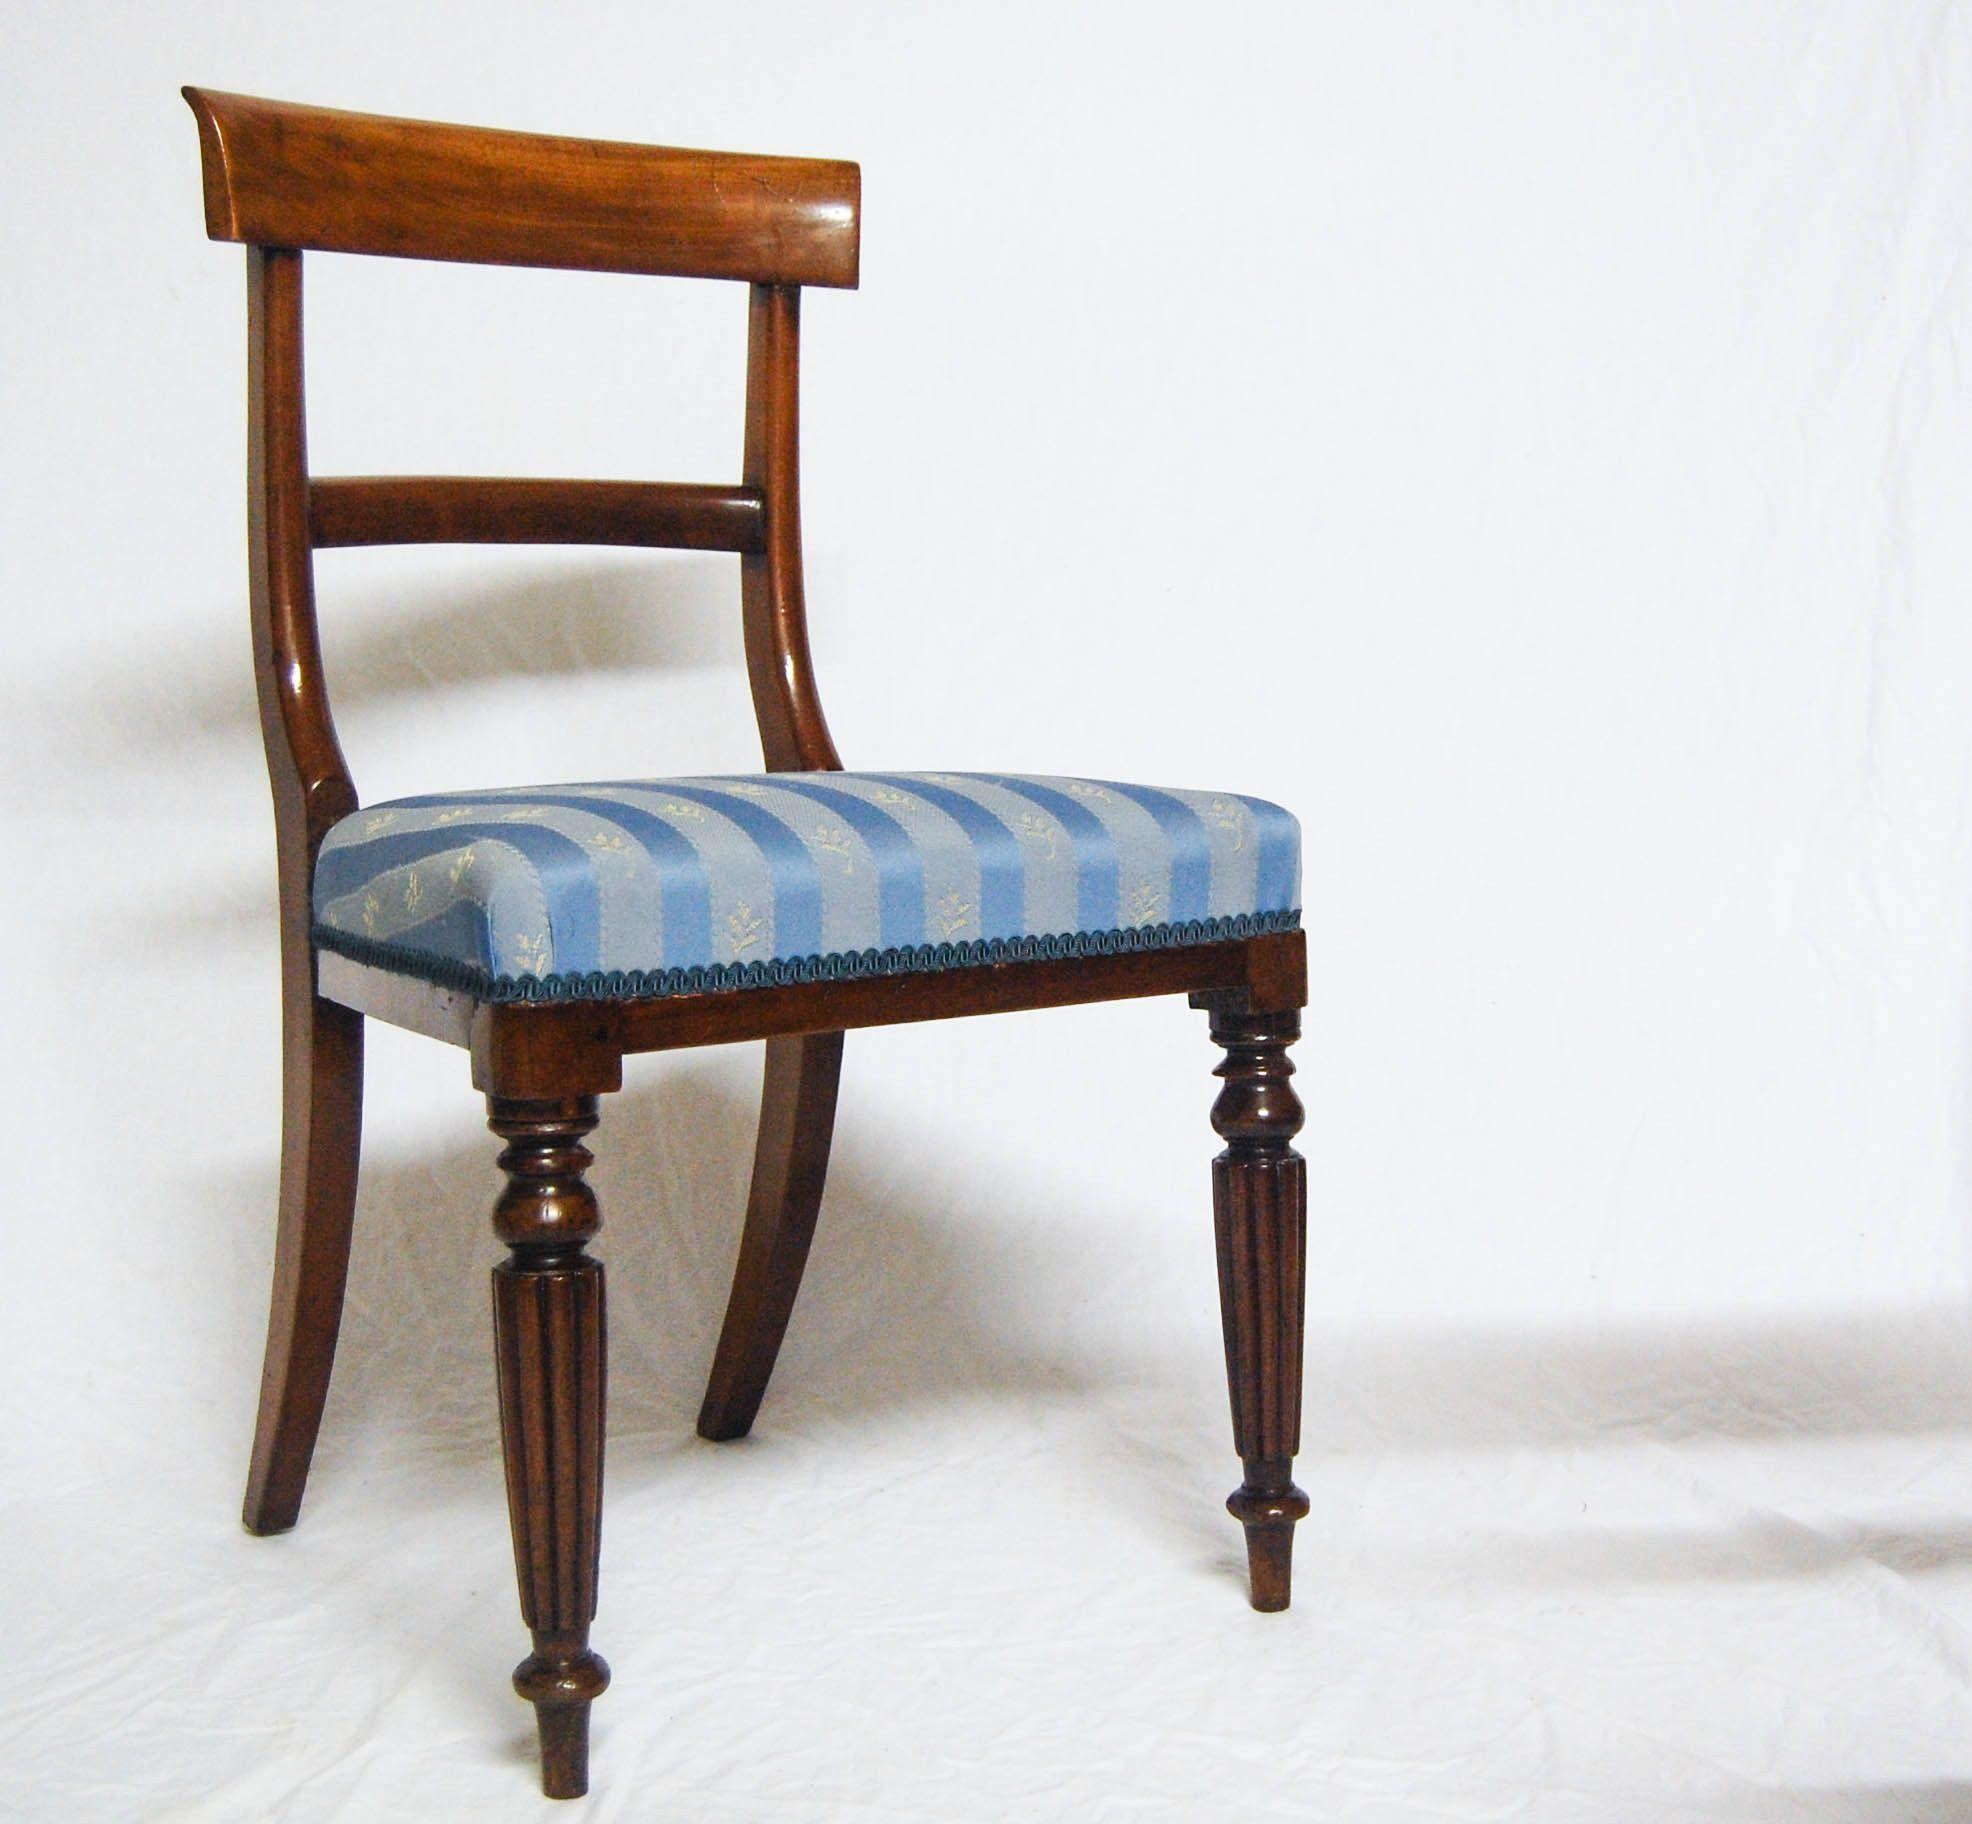 Antique regency dining chairs - A Set Of Four Regency George Iv Mahogany Trafalgar Dining Chairs Jasonclarkeltd Antique